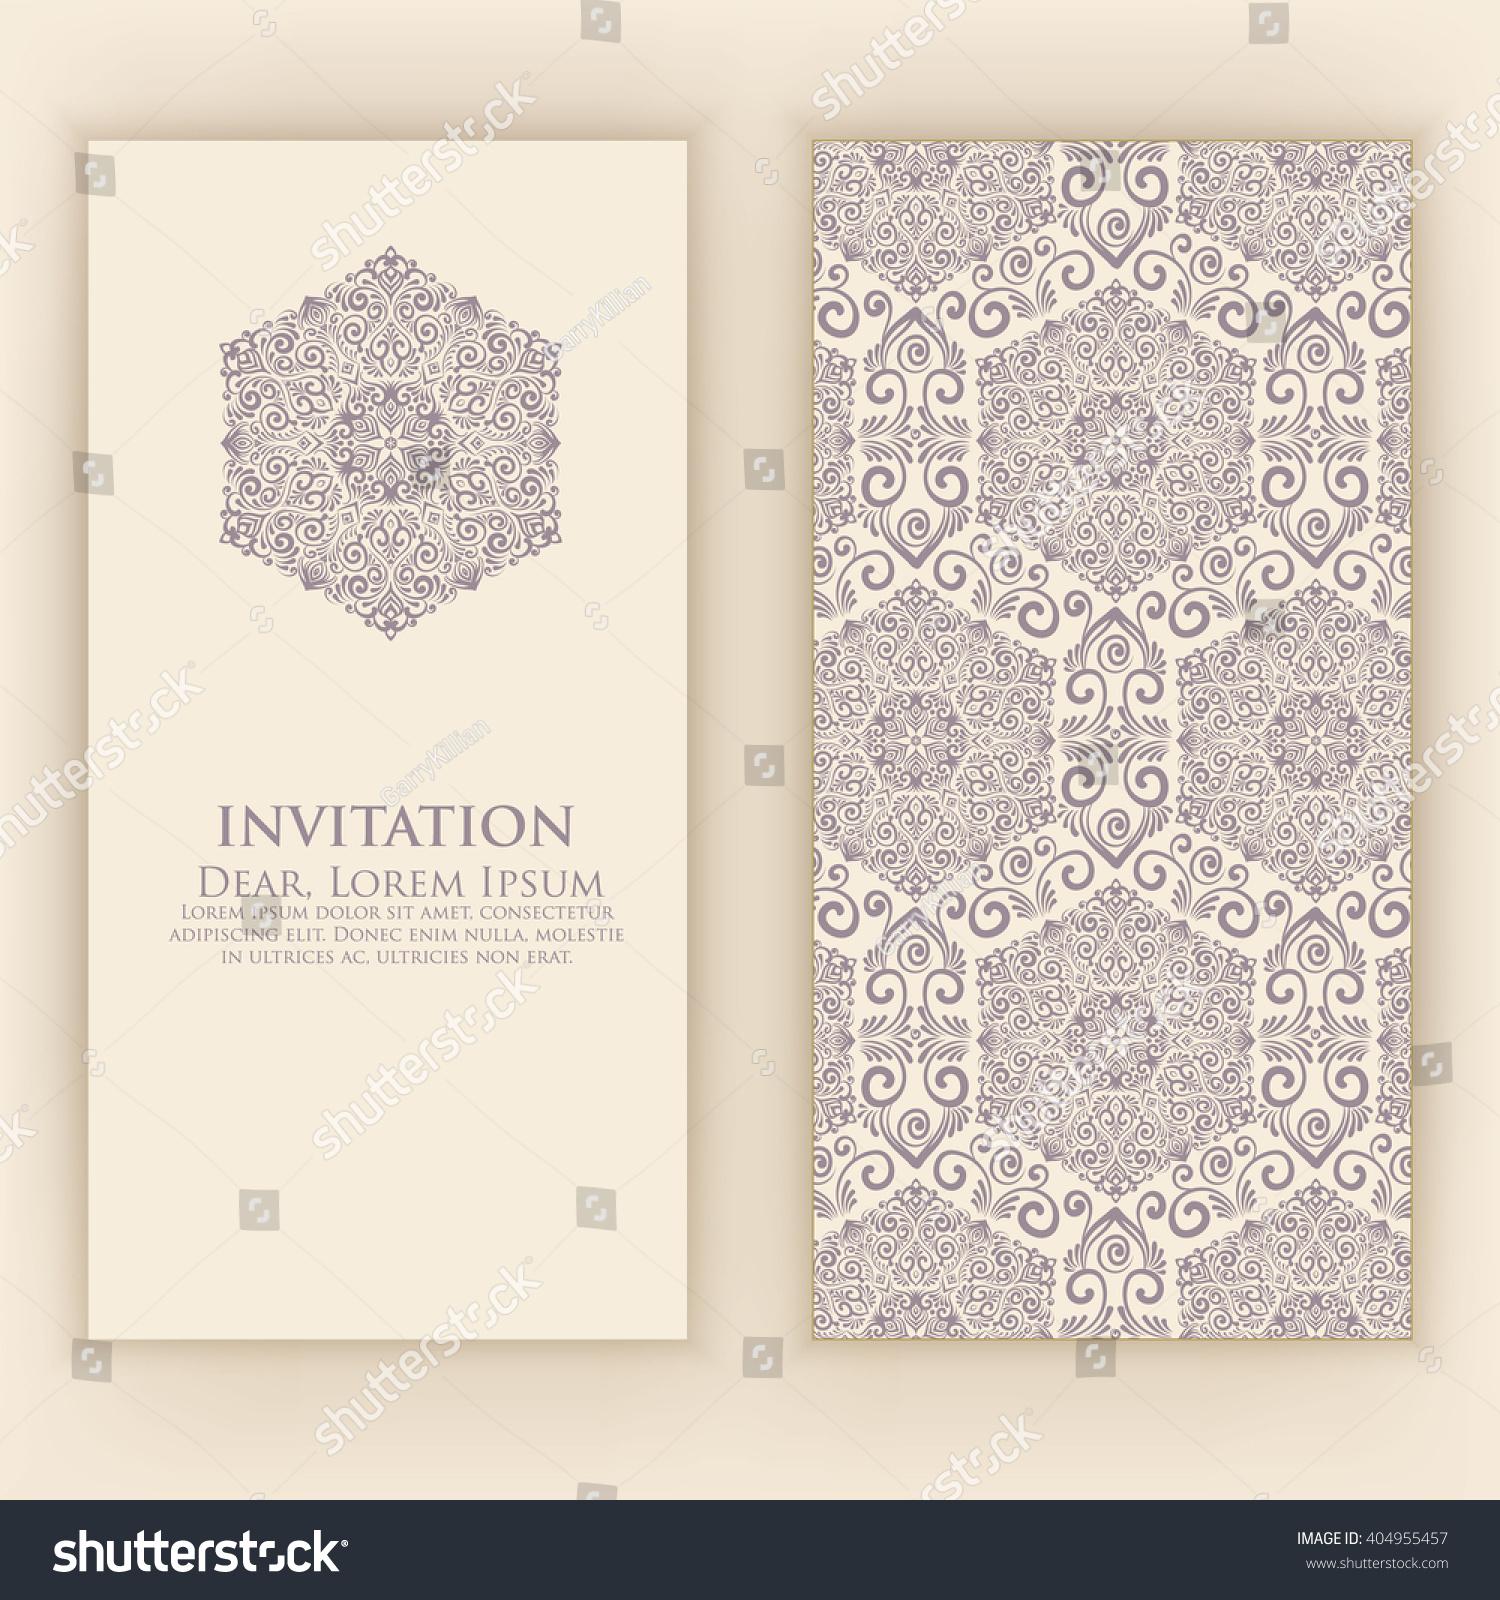 Invitation Wedding Card Damask Background Elegant Stock Vector ...